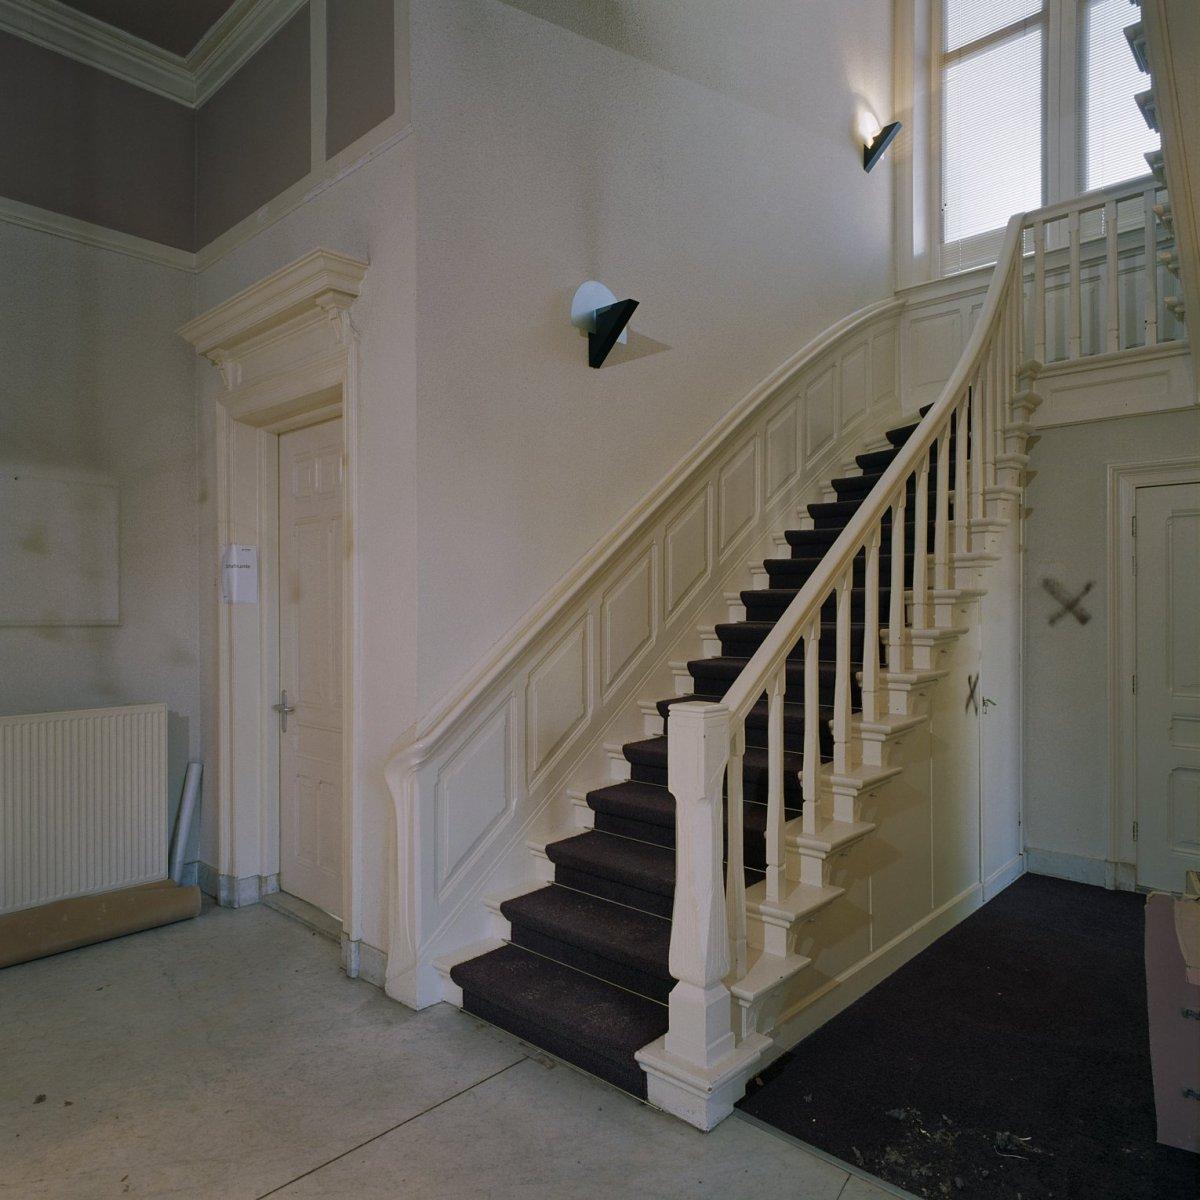 File interieur centrale hal overzicht trap voor restauratie groningen 20361550 - Interieur trap ...